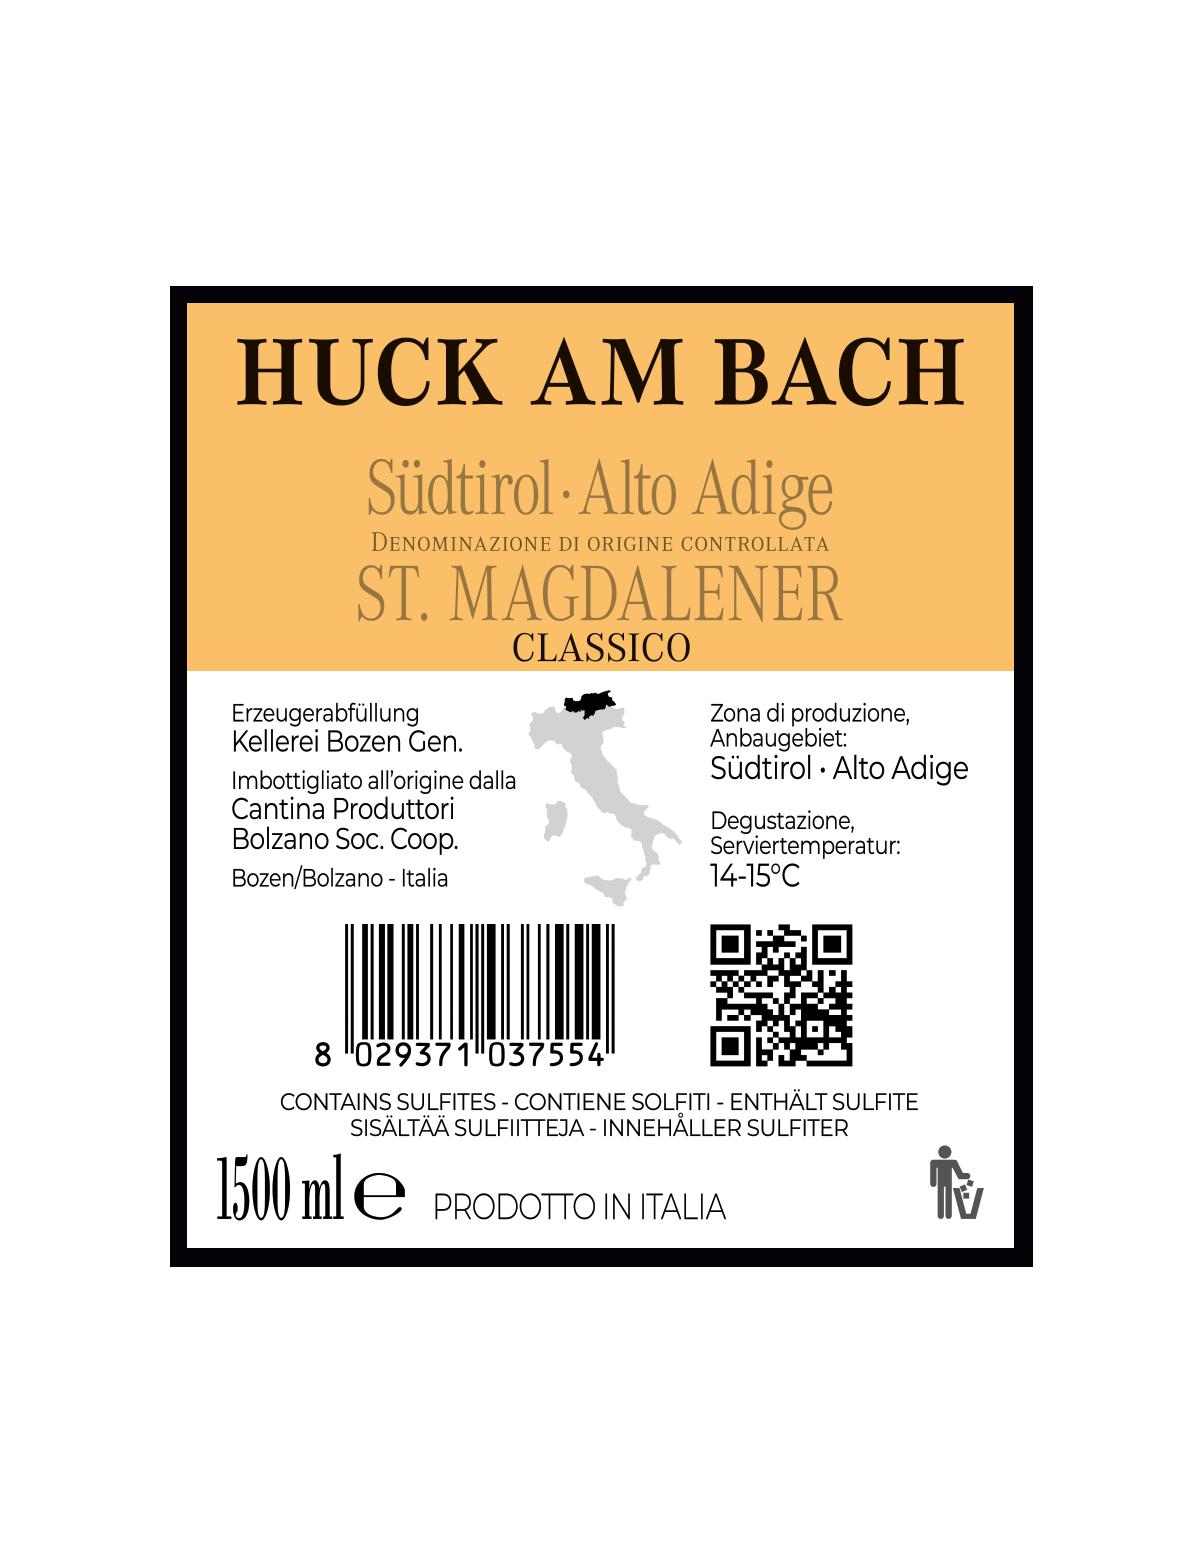 Magnum HUCK AM BACH ST. MAGDALENER CLASSICO Südtirol • Alto Adige DOC 2019